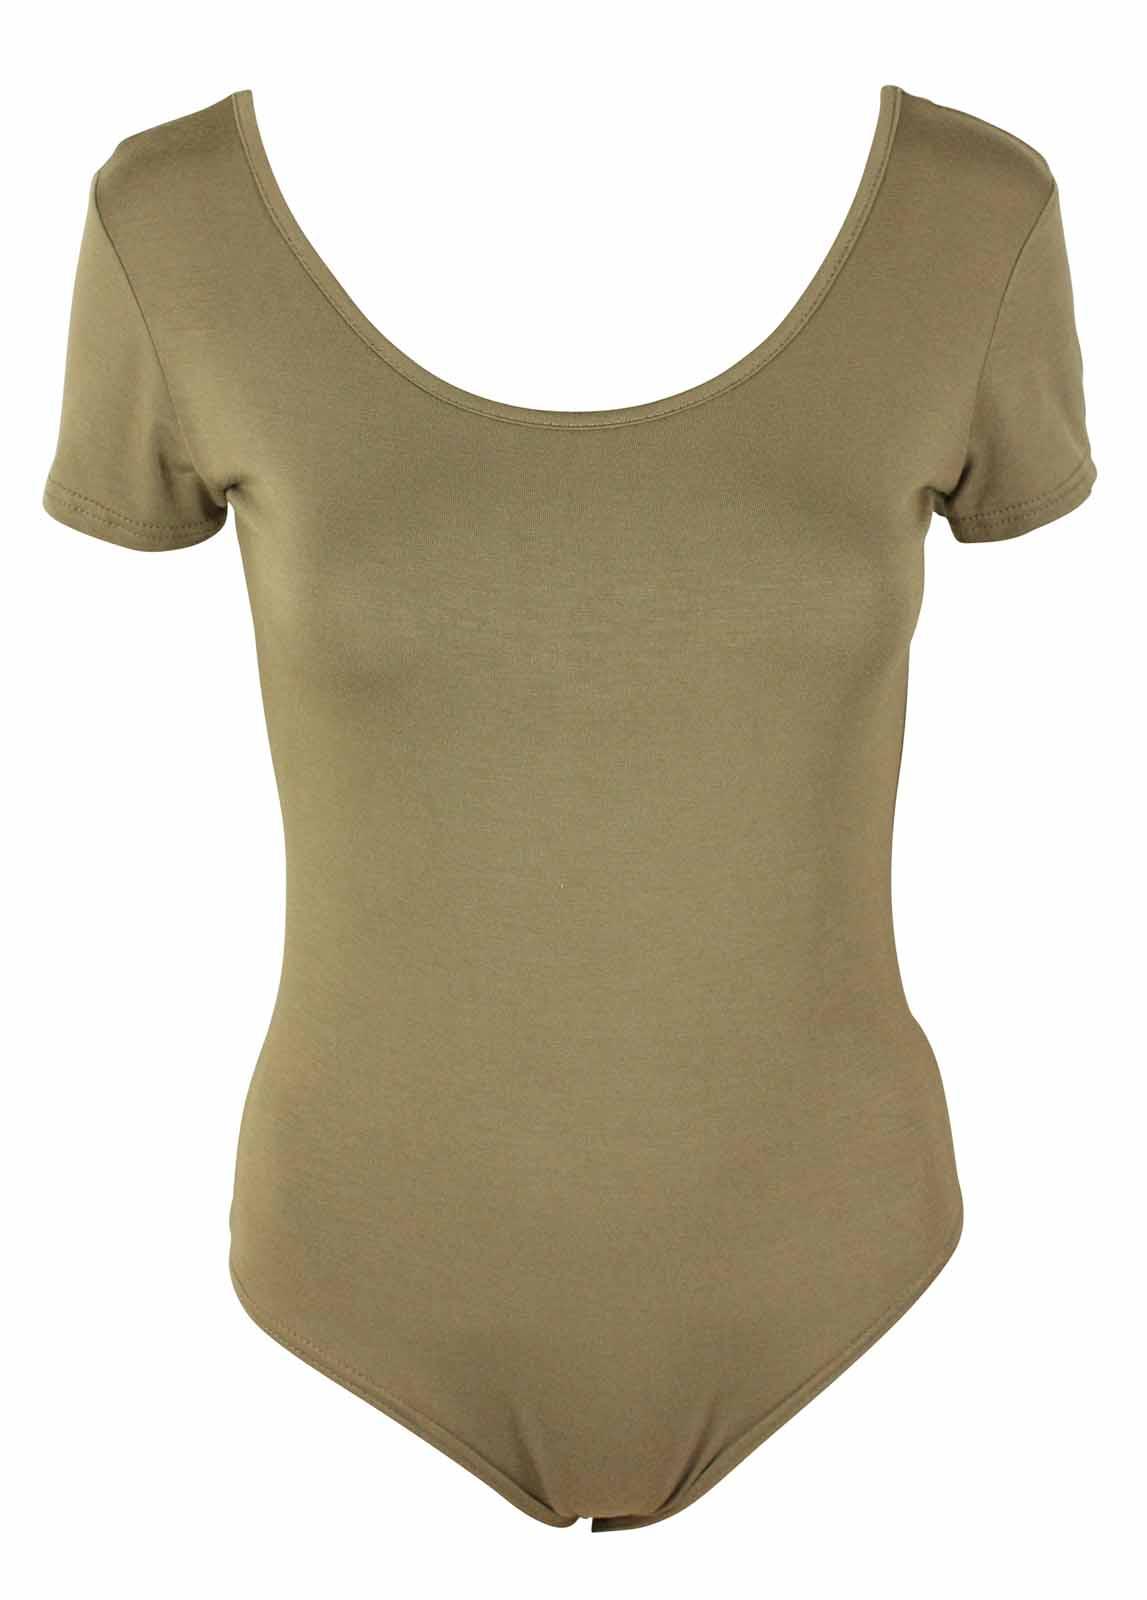 WOMENS-STRETCH-PLAIN-LEOTARD-LADIES-SHORT-SLEEVE-BODYSUIT-TOP-PLUS-SIZE-16-26